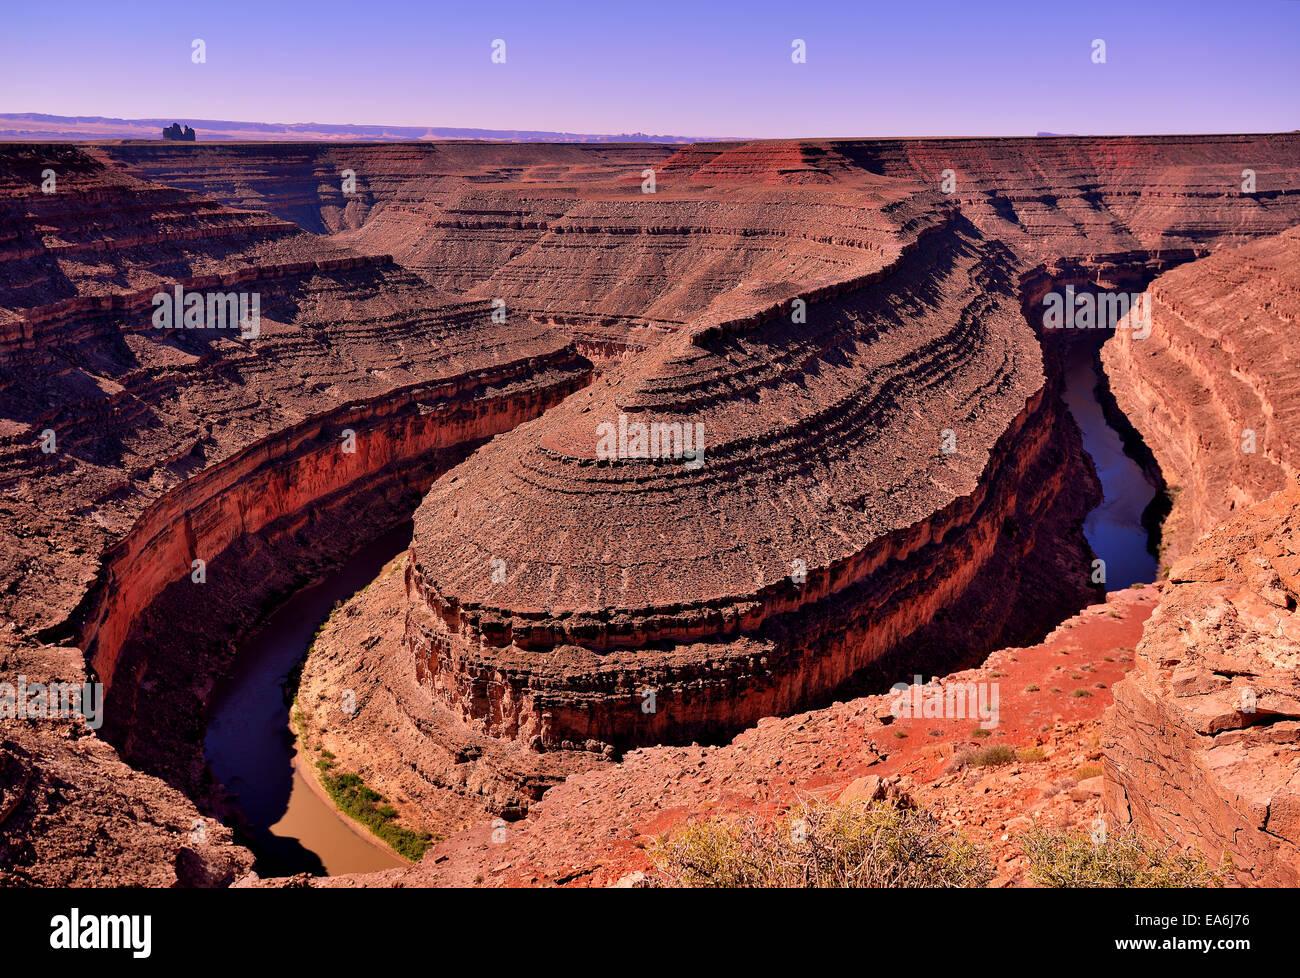 Horseshoe Bend, Page, Arizona, America, USA - Stock Image